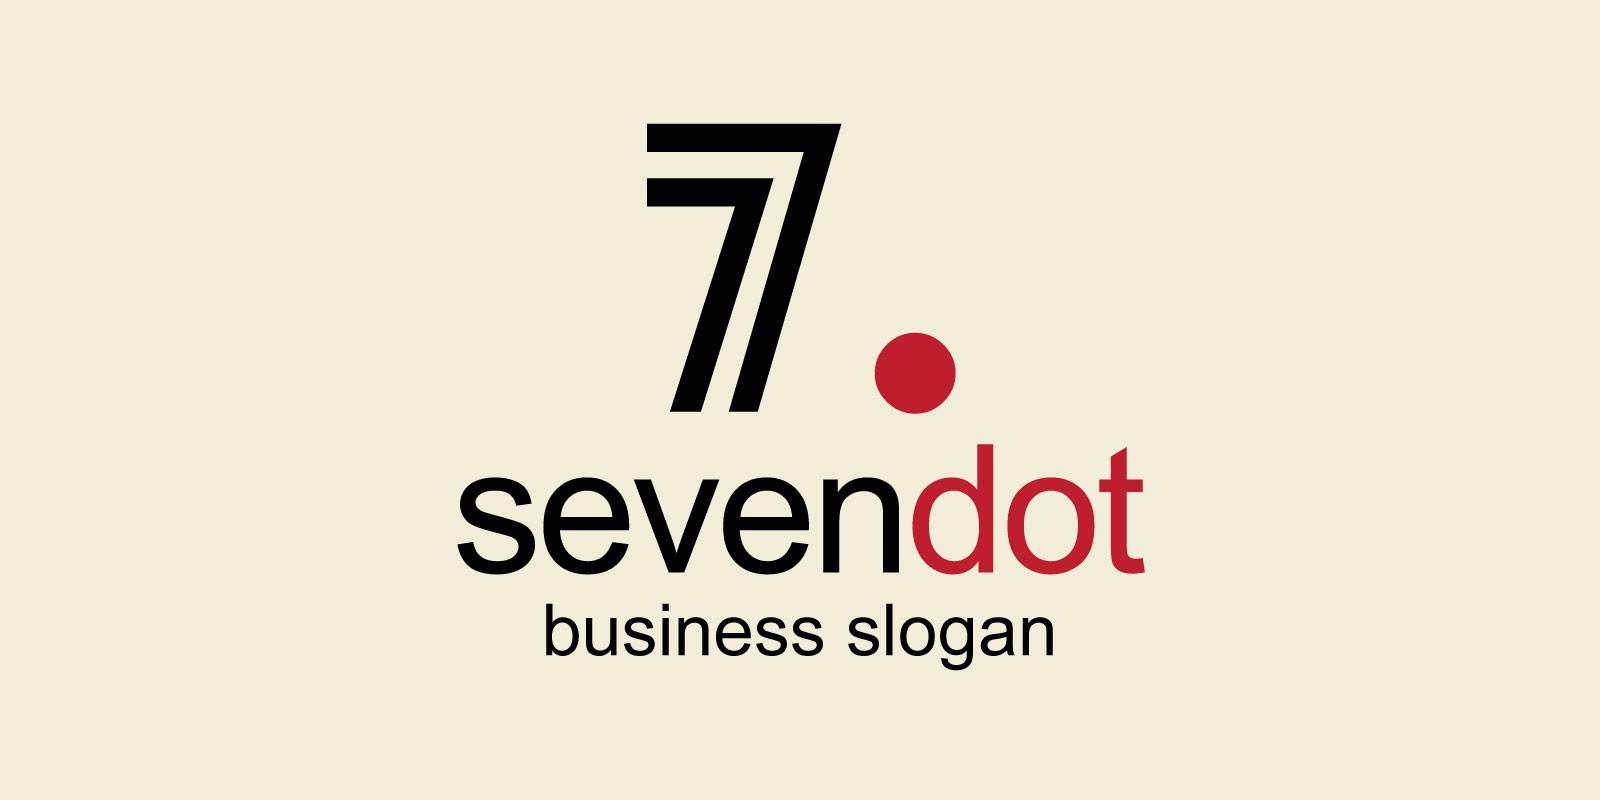 Sevendot Seven Number Logo